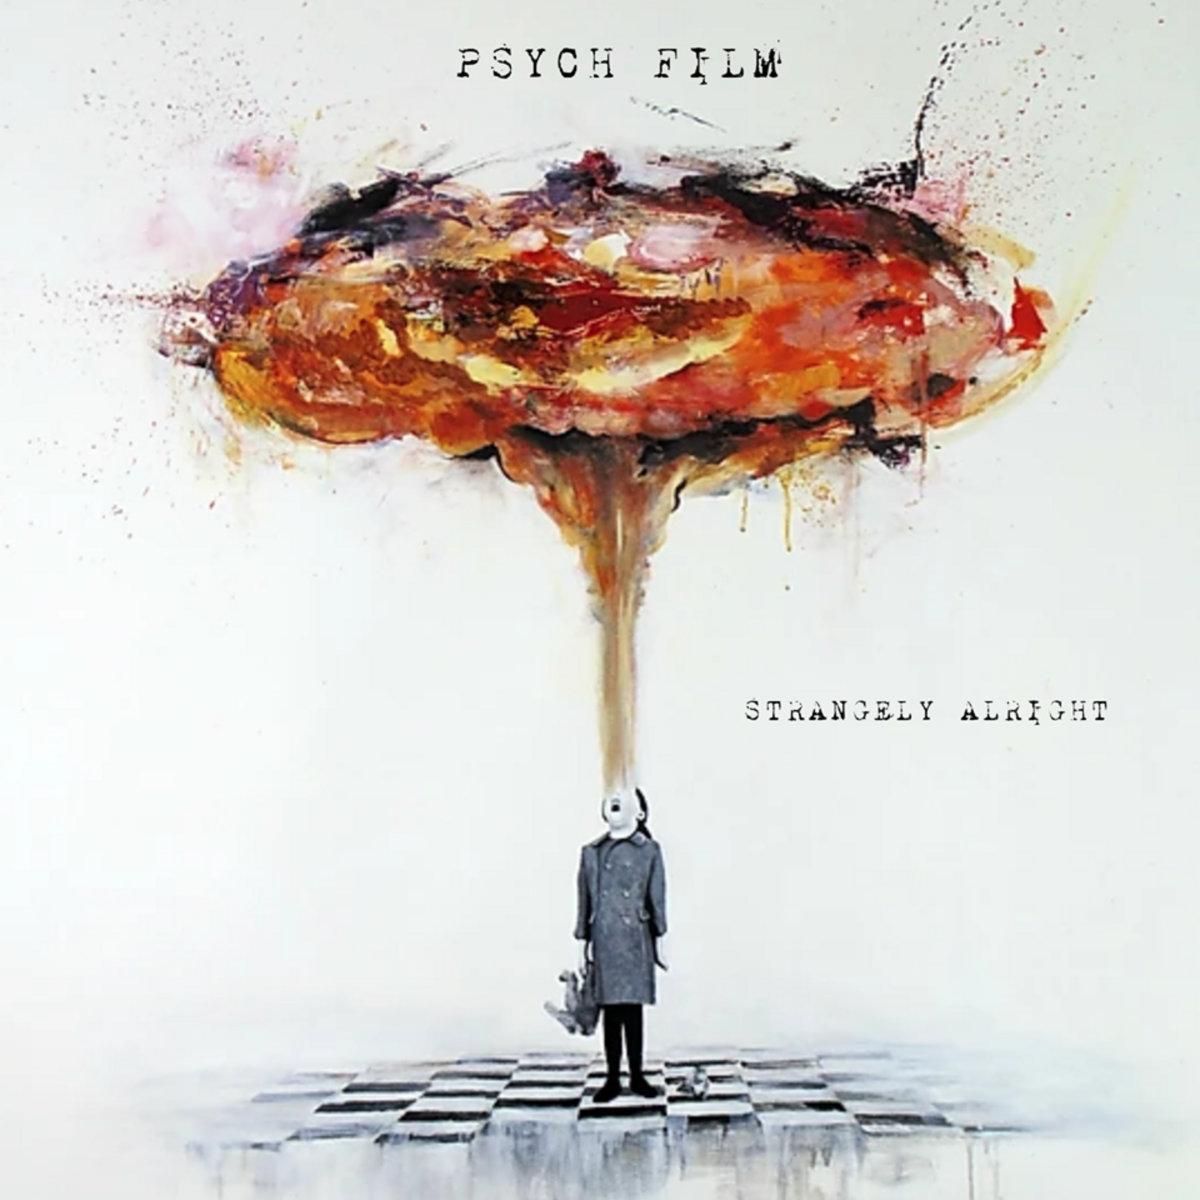 Psych Film by Strangely Alright